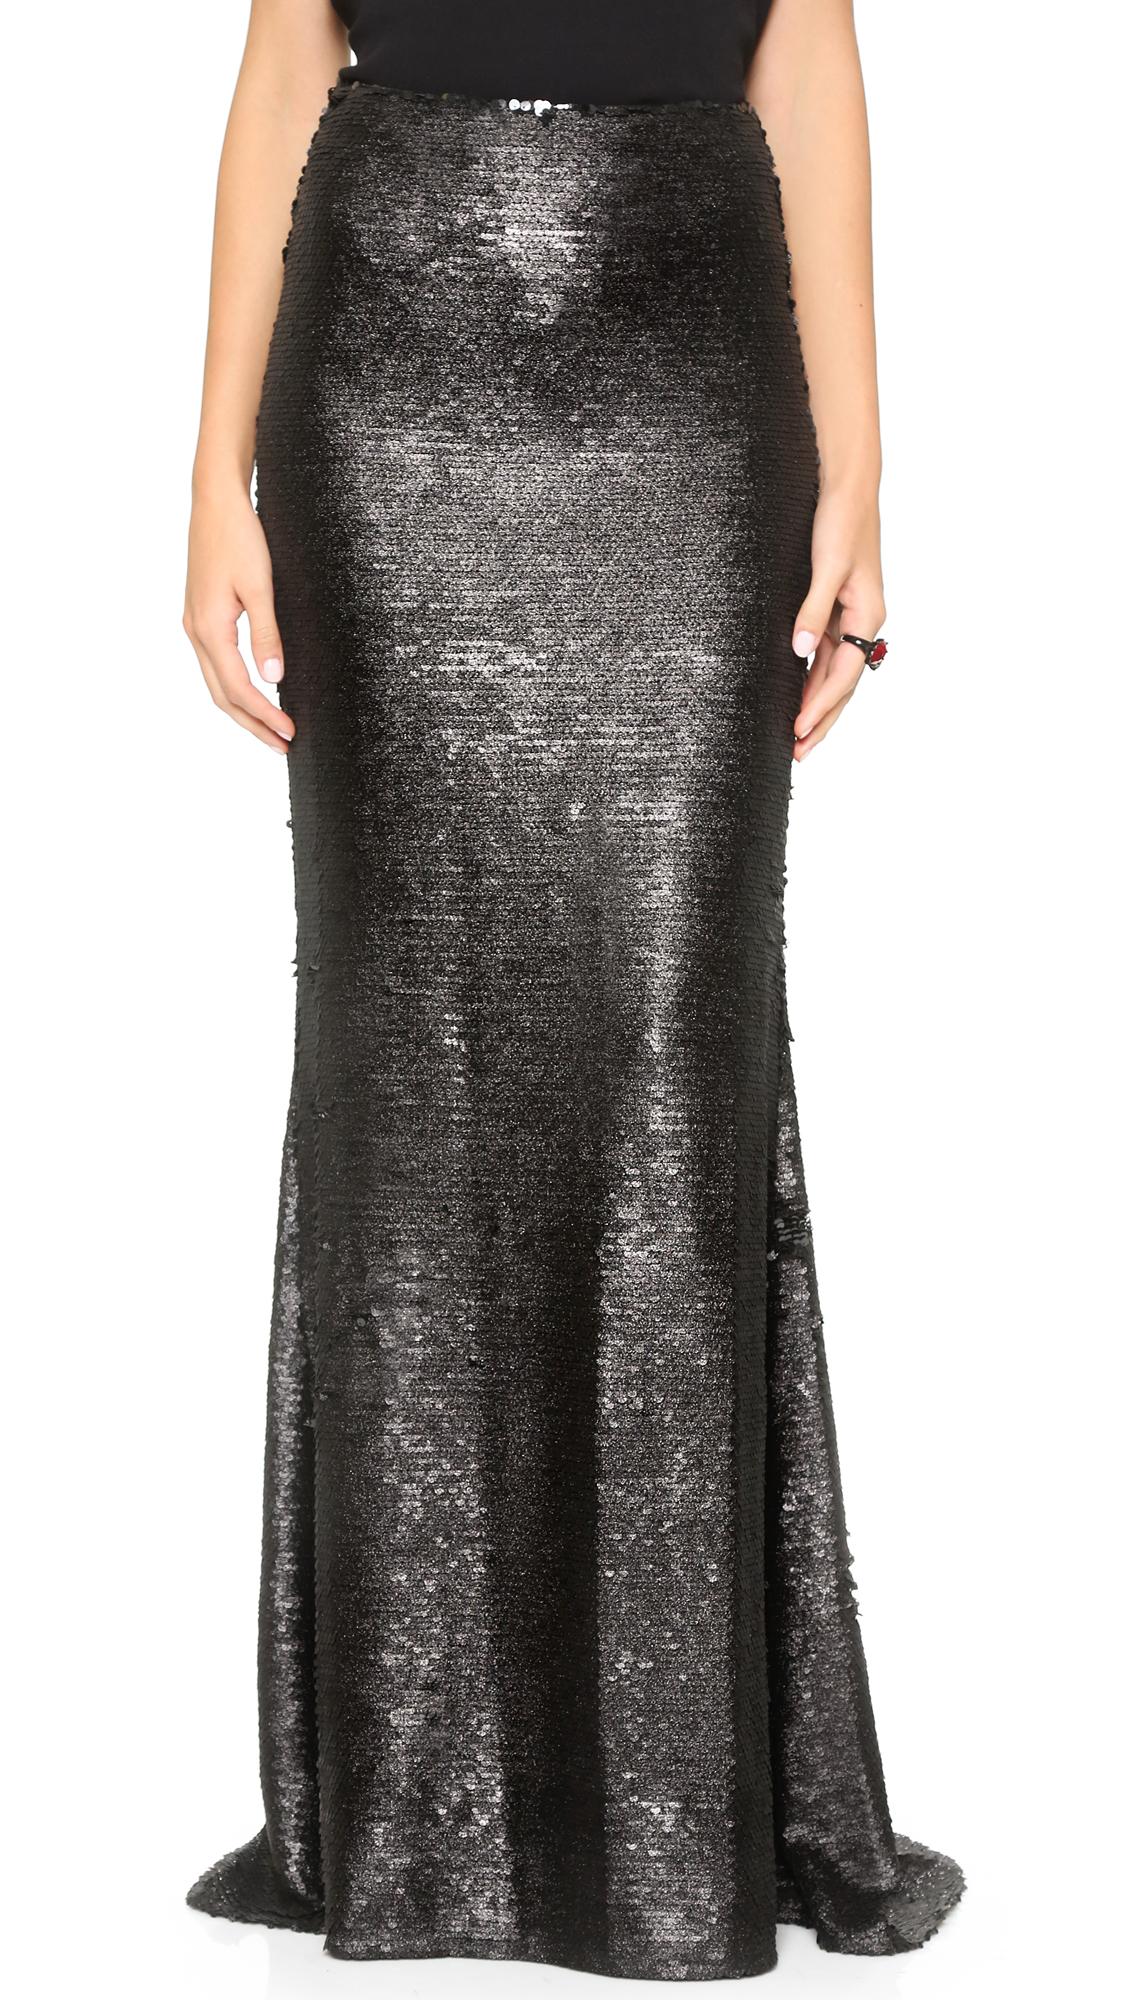 Badgley mischka Sparkle Sequin Skirt - Black in Black | Lyst